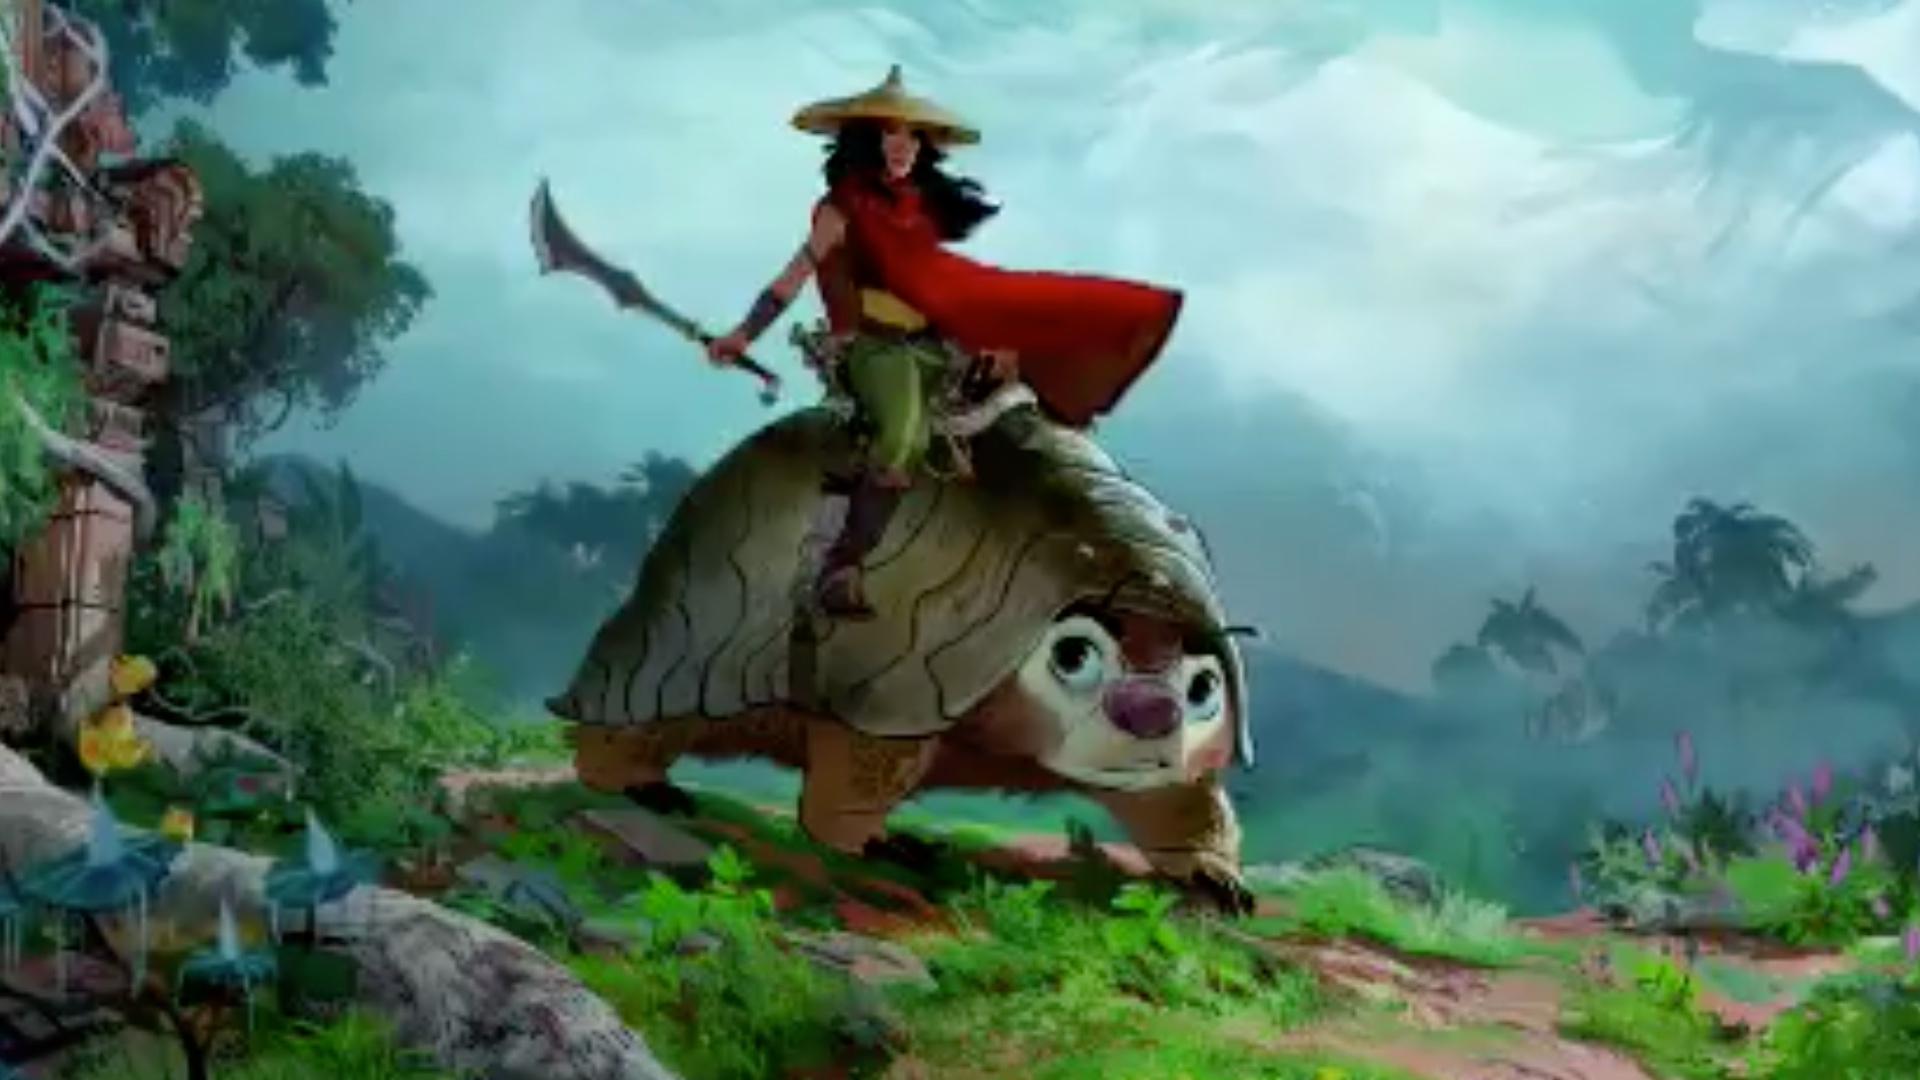 disney-announces-raya-and-the-last-dragon-animated-film-social.jpg